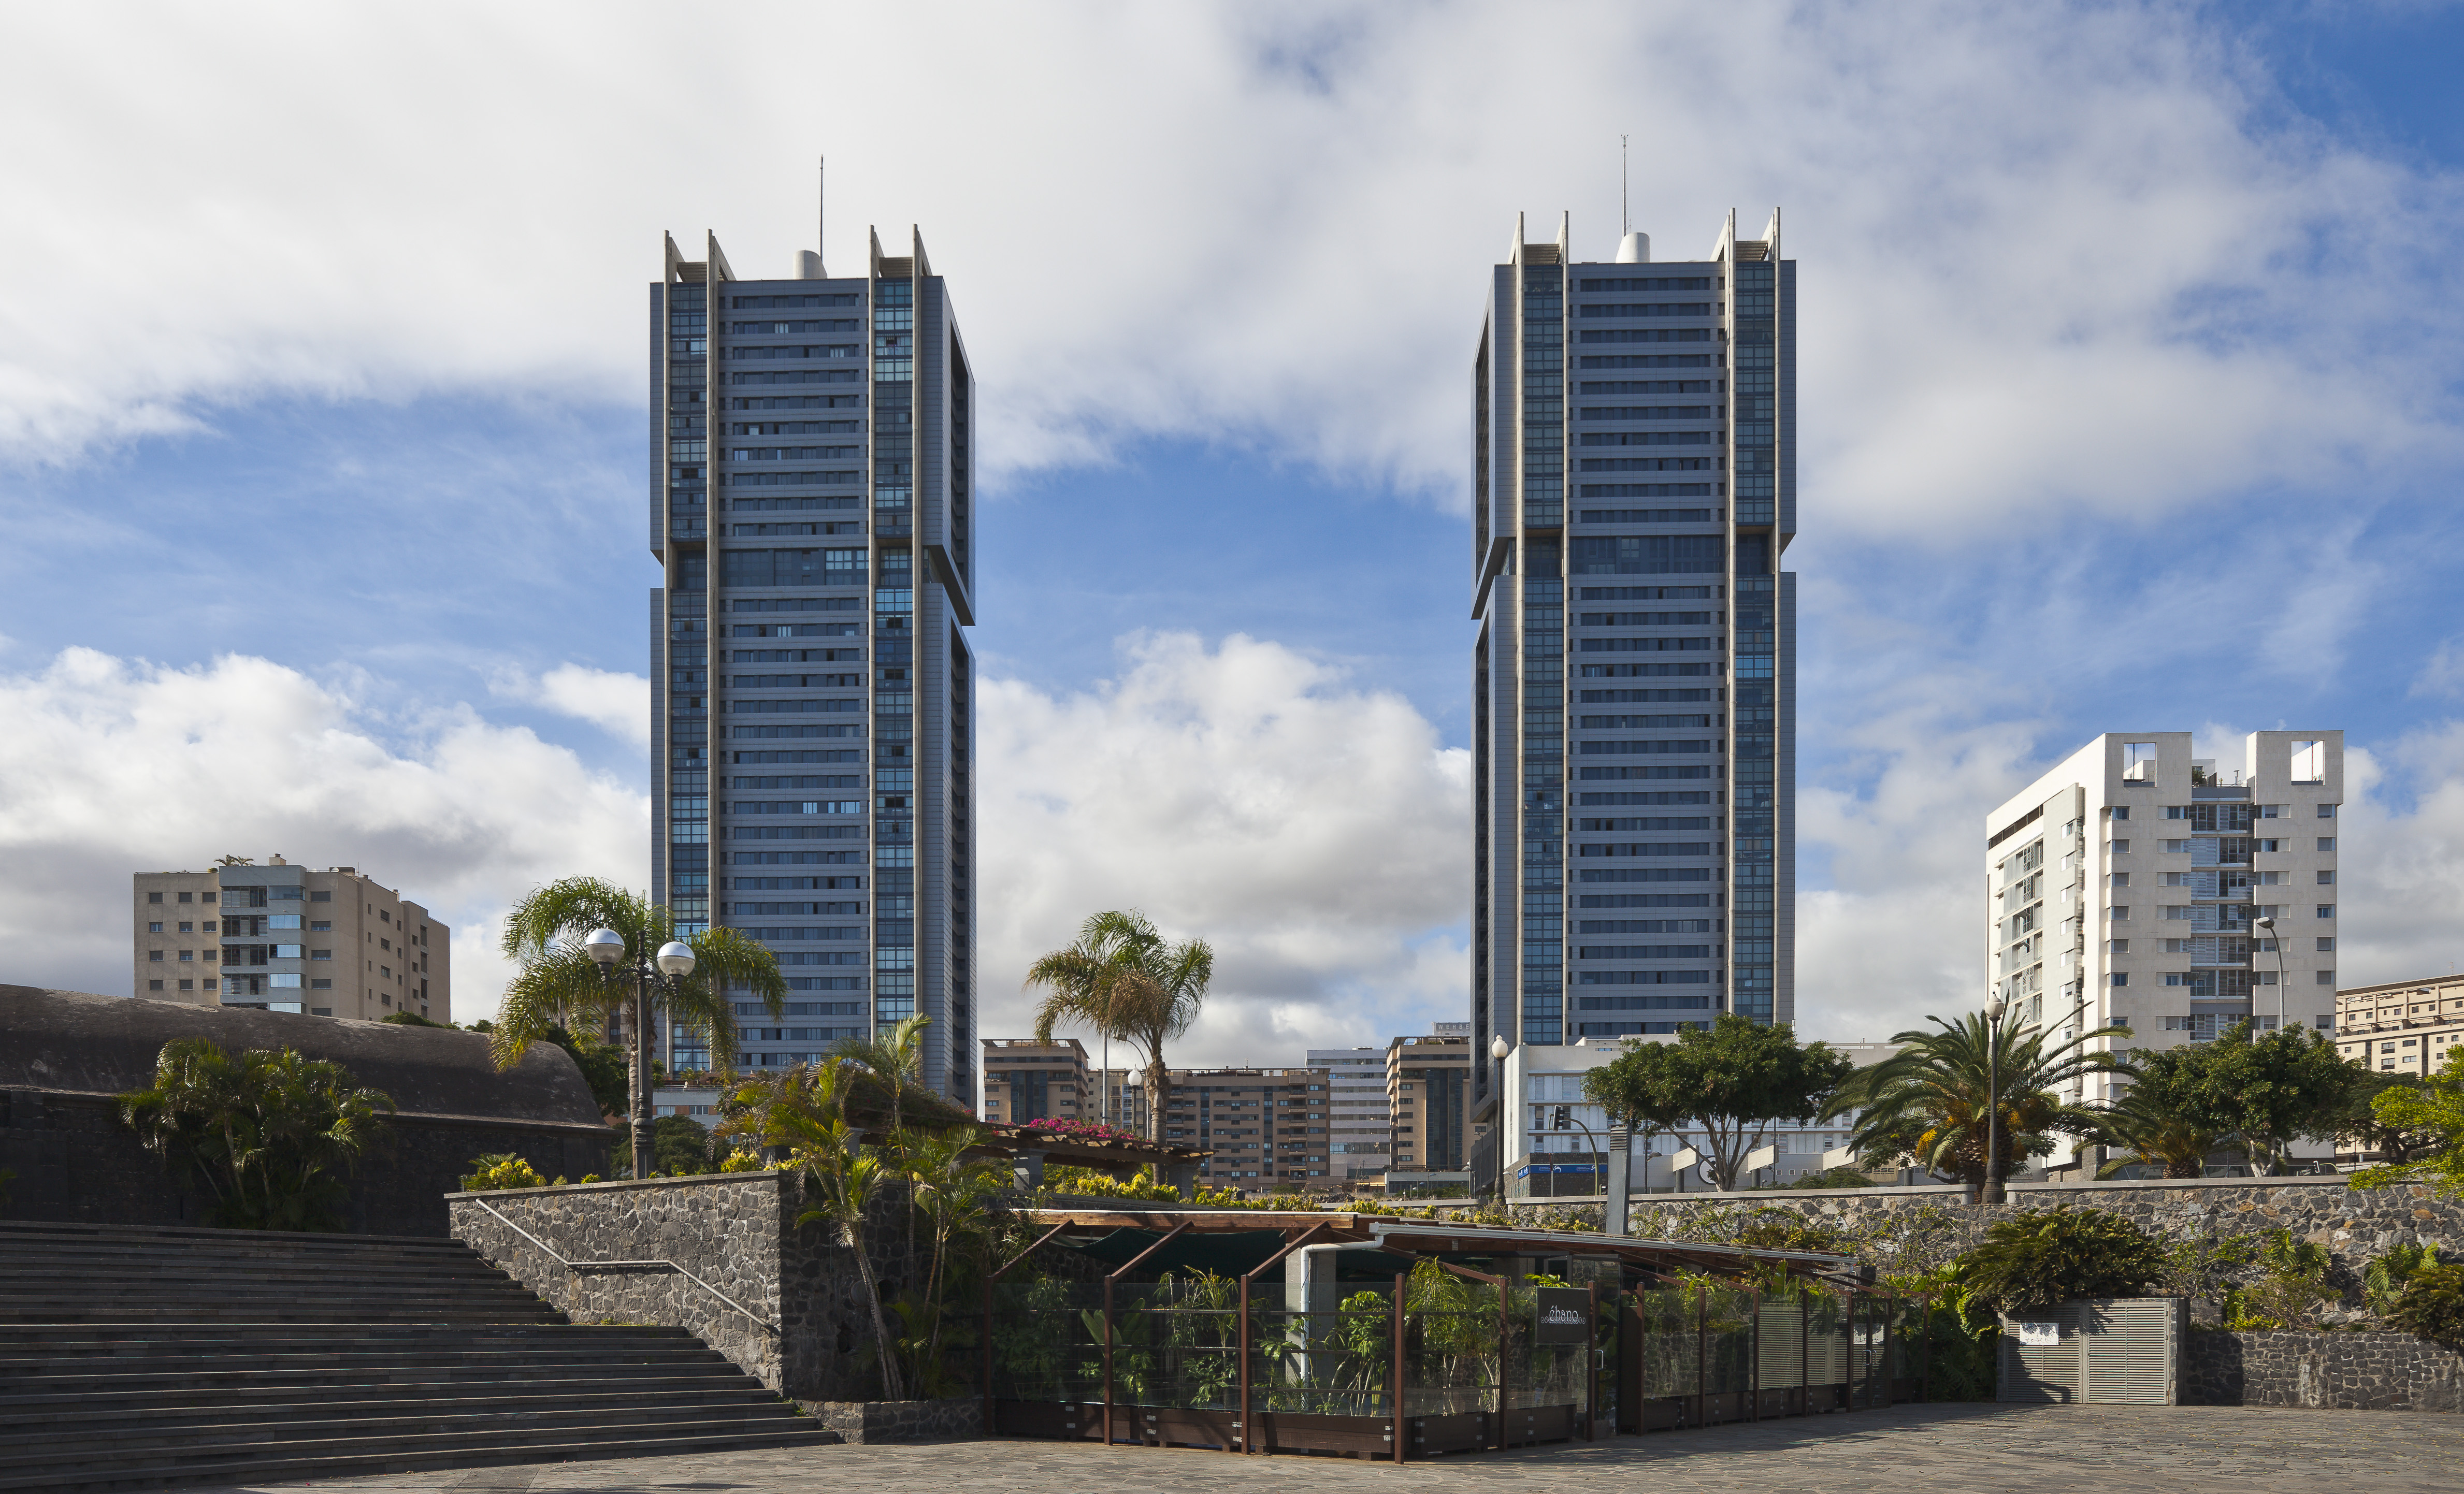 Torres de santa cruz santa cruz de tenerife espa a 2012 - Apartamentos las torres tenerife ...